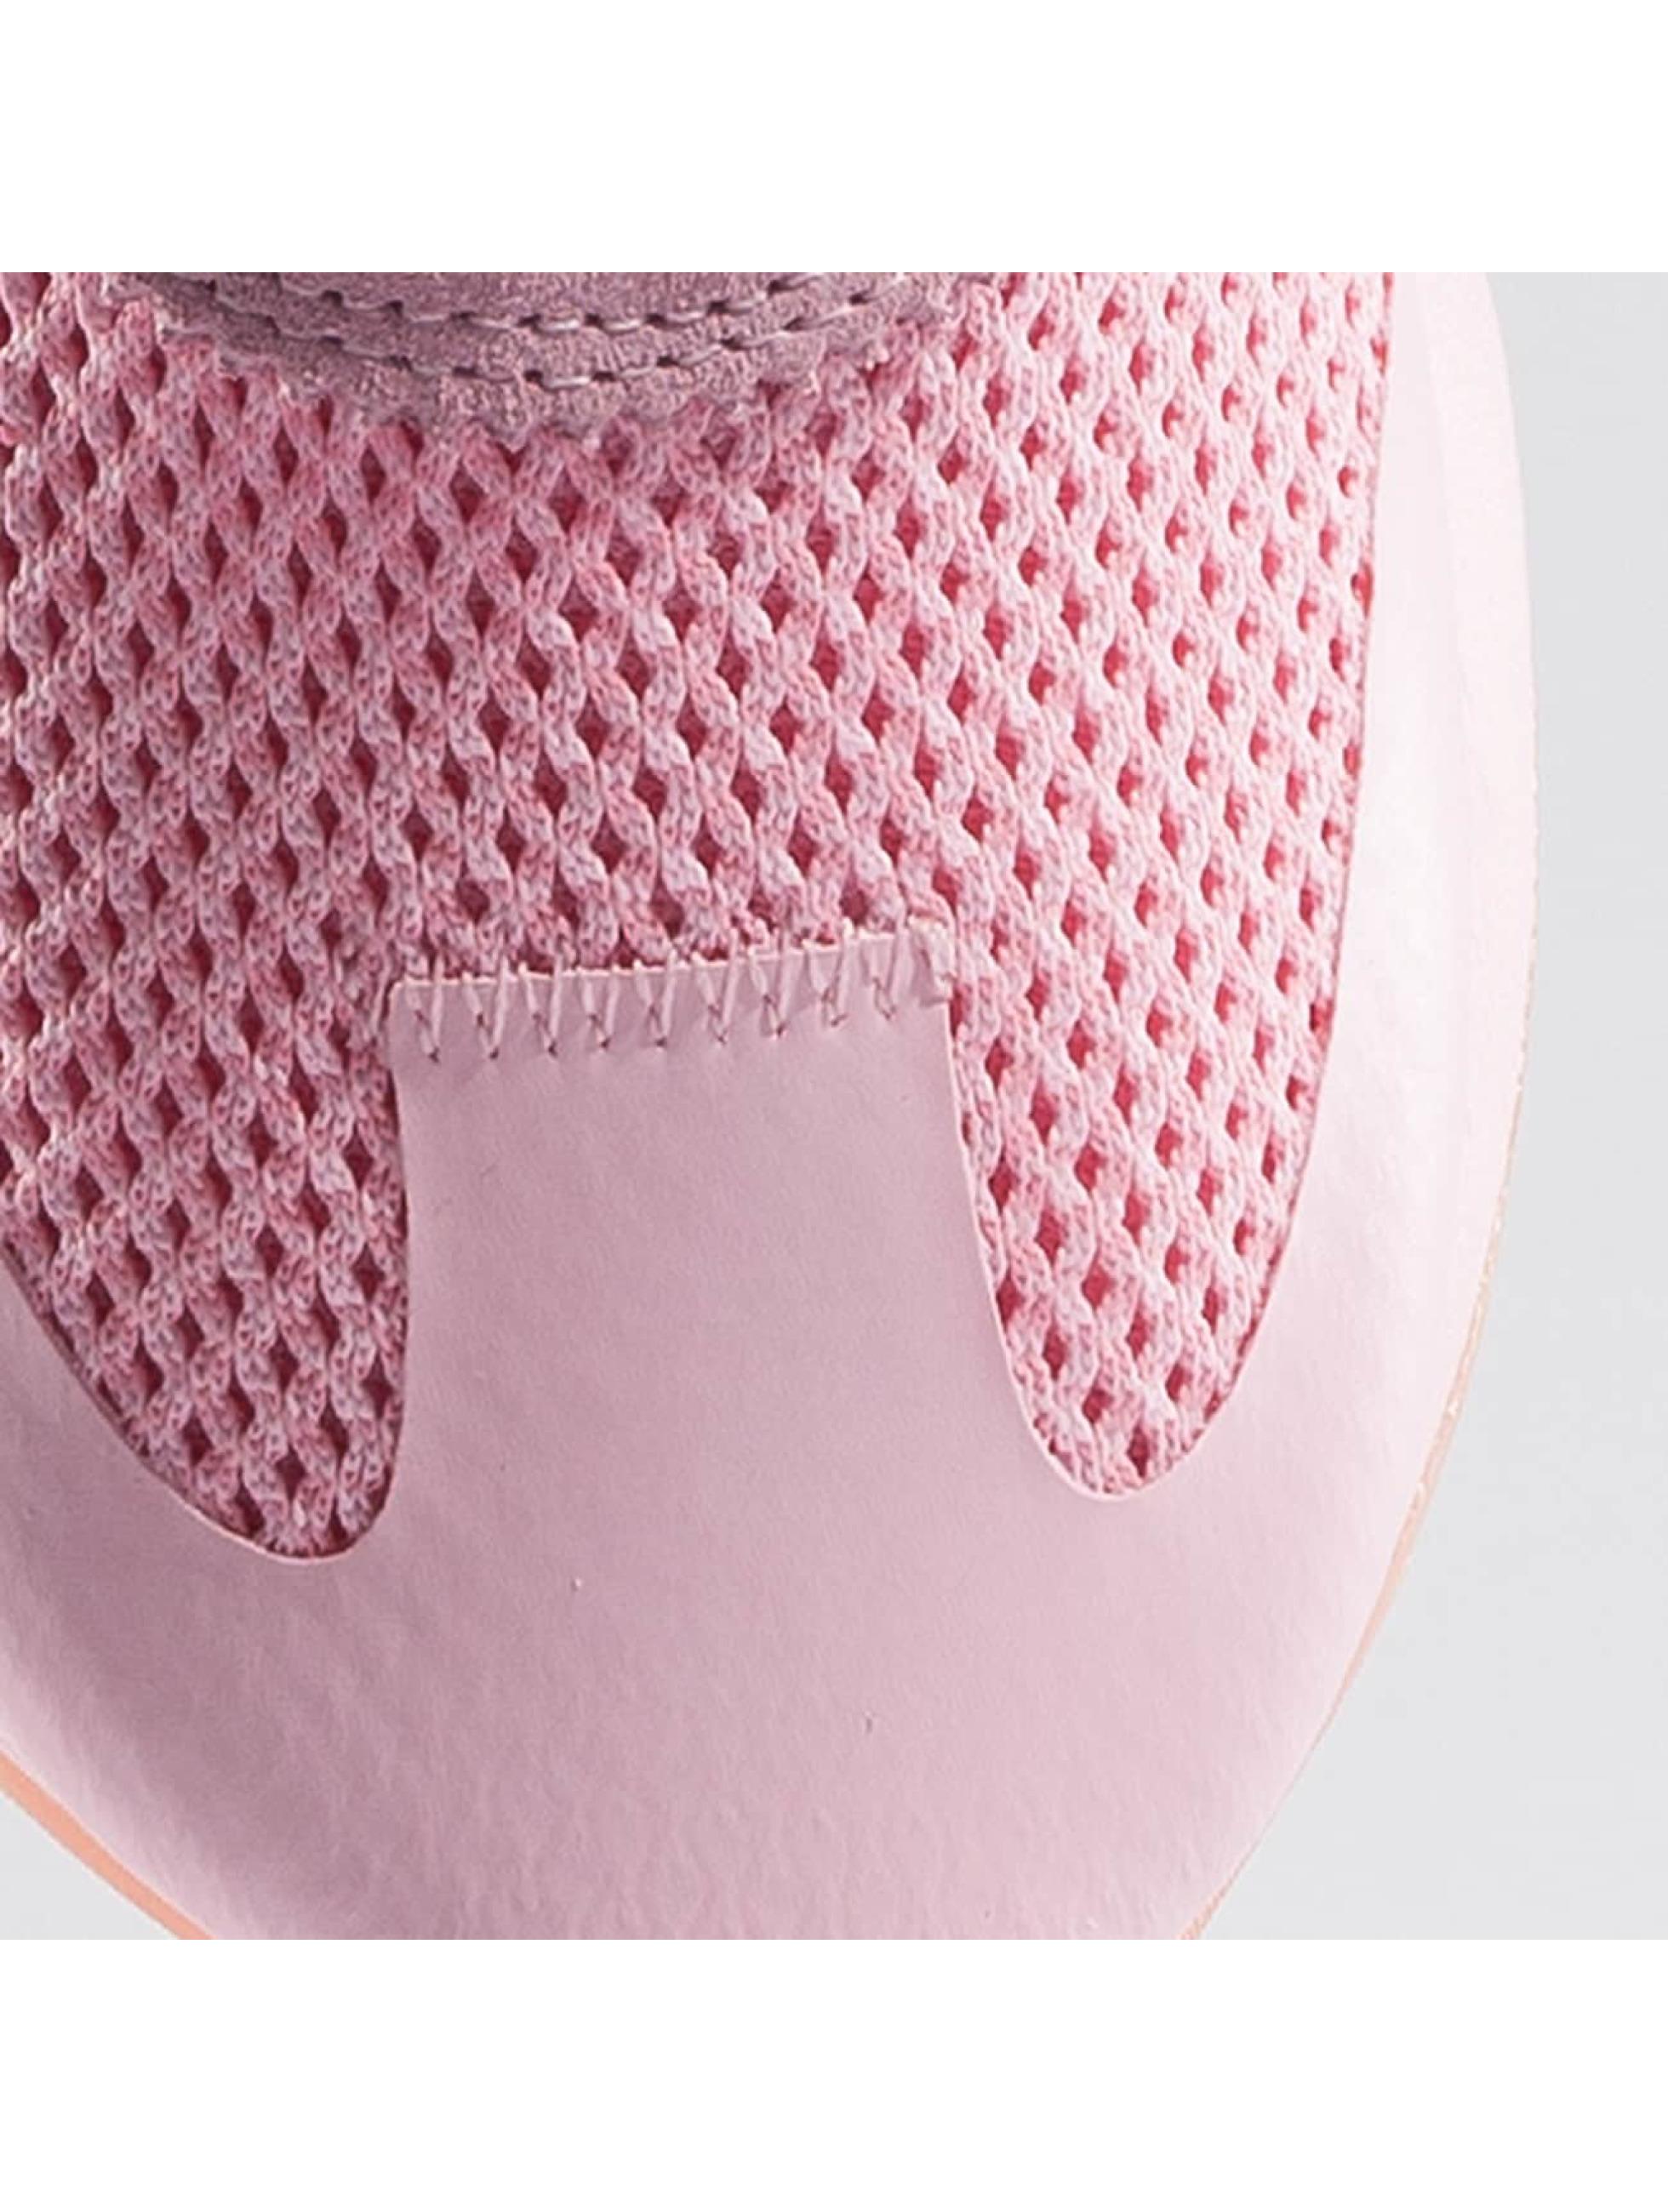 adidas originals Sneakers FLB W pink